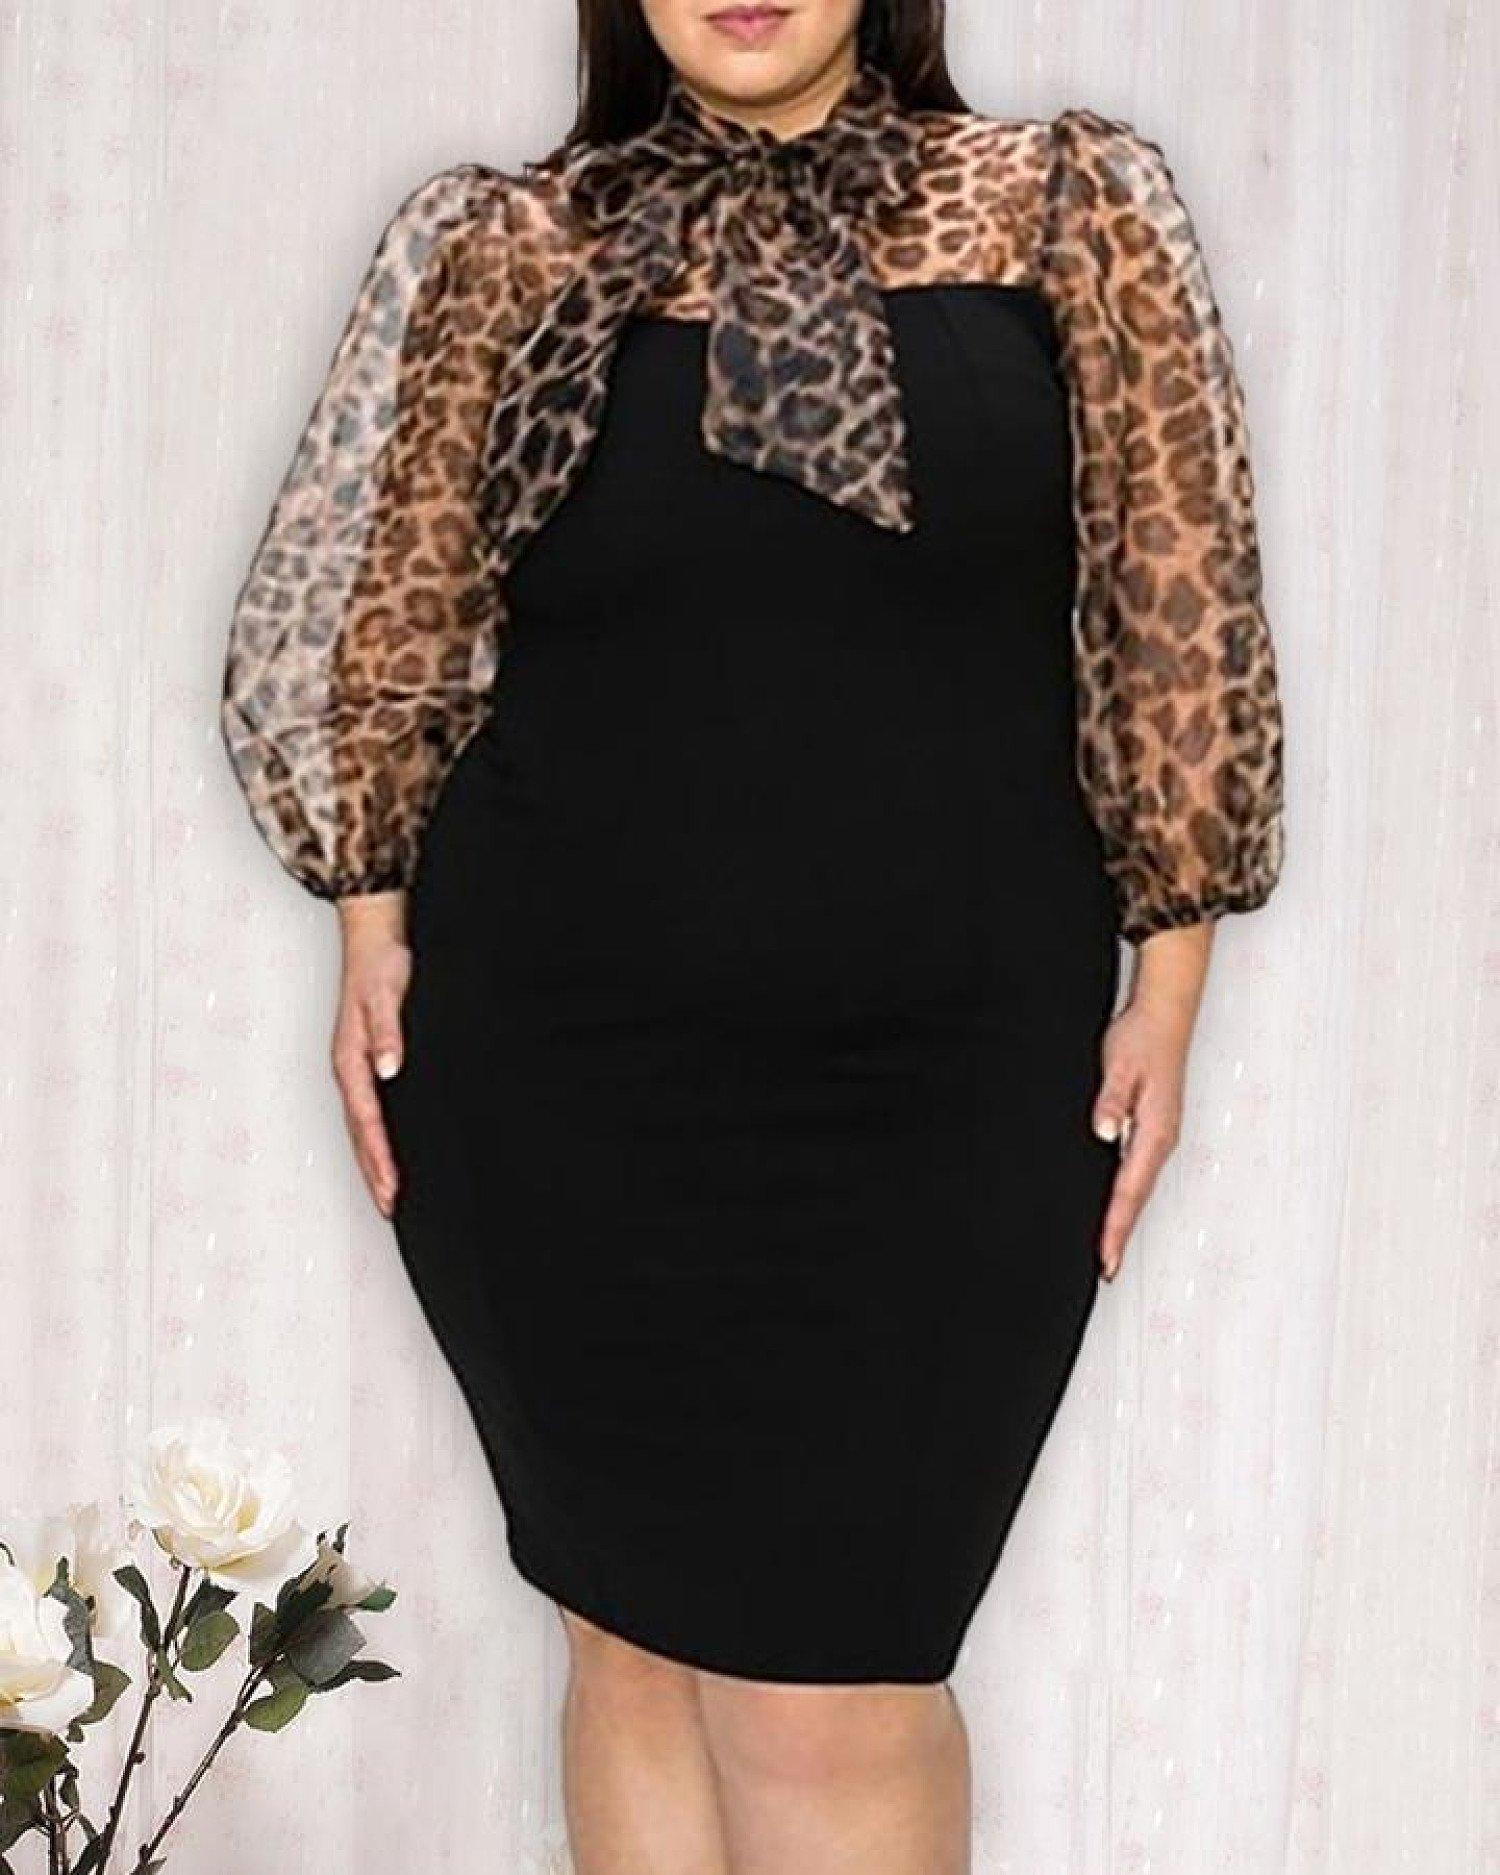 Plus Size Leopard Print Patchwork Bodycon Dress Free Postage